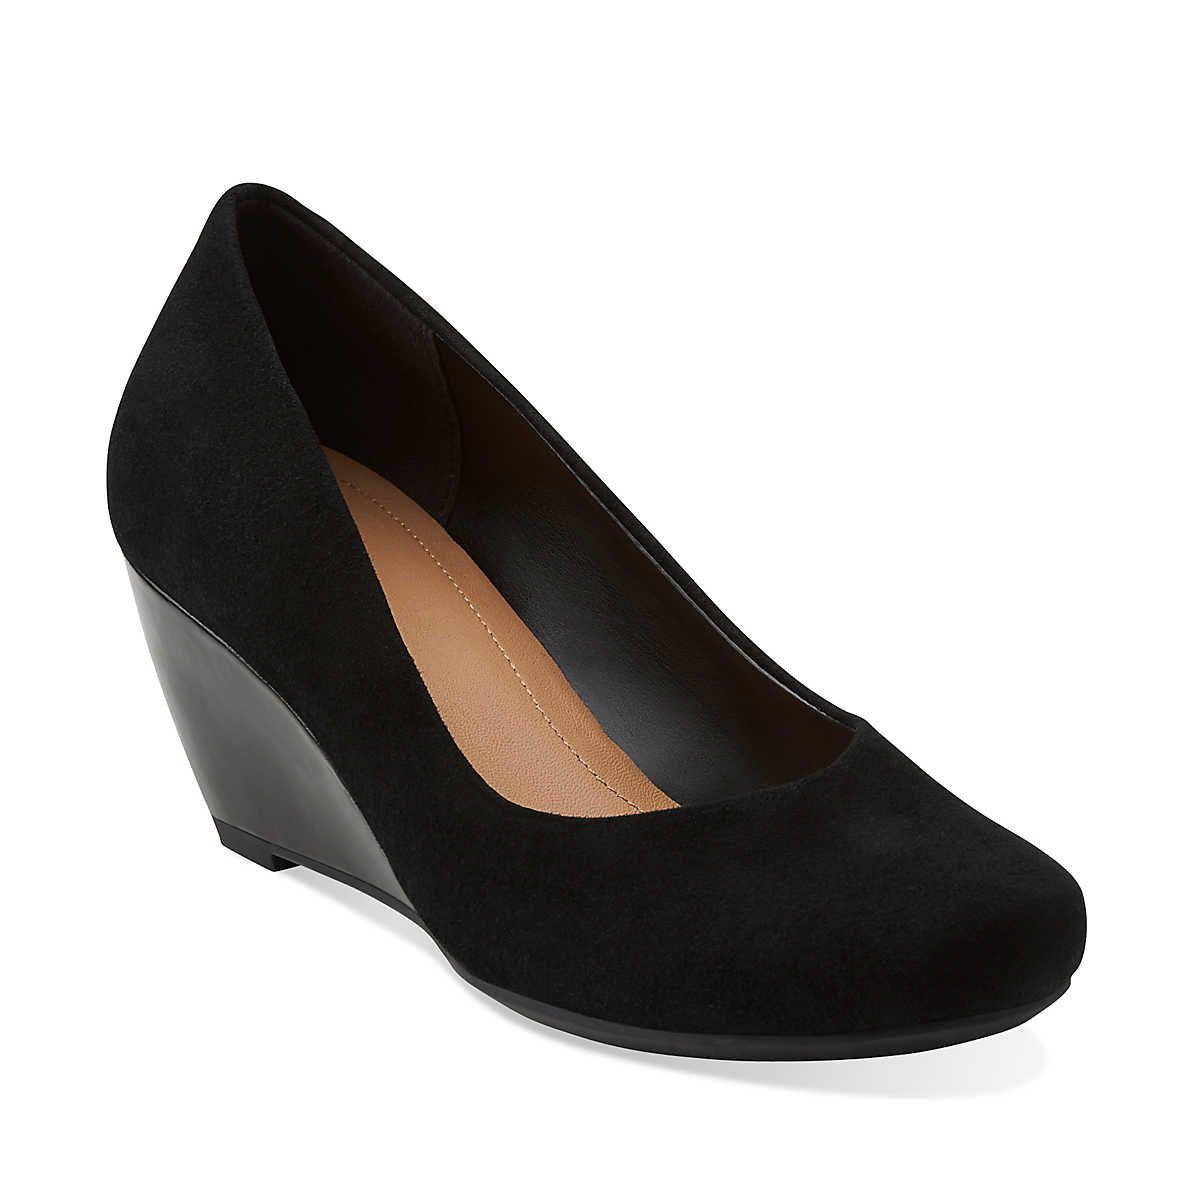 Womens Shoes Clarks Bassett Mine Black Suede